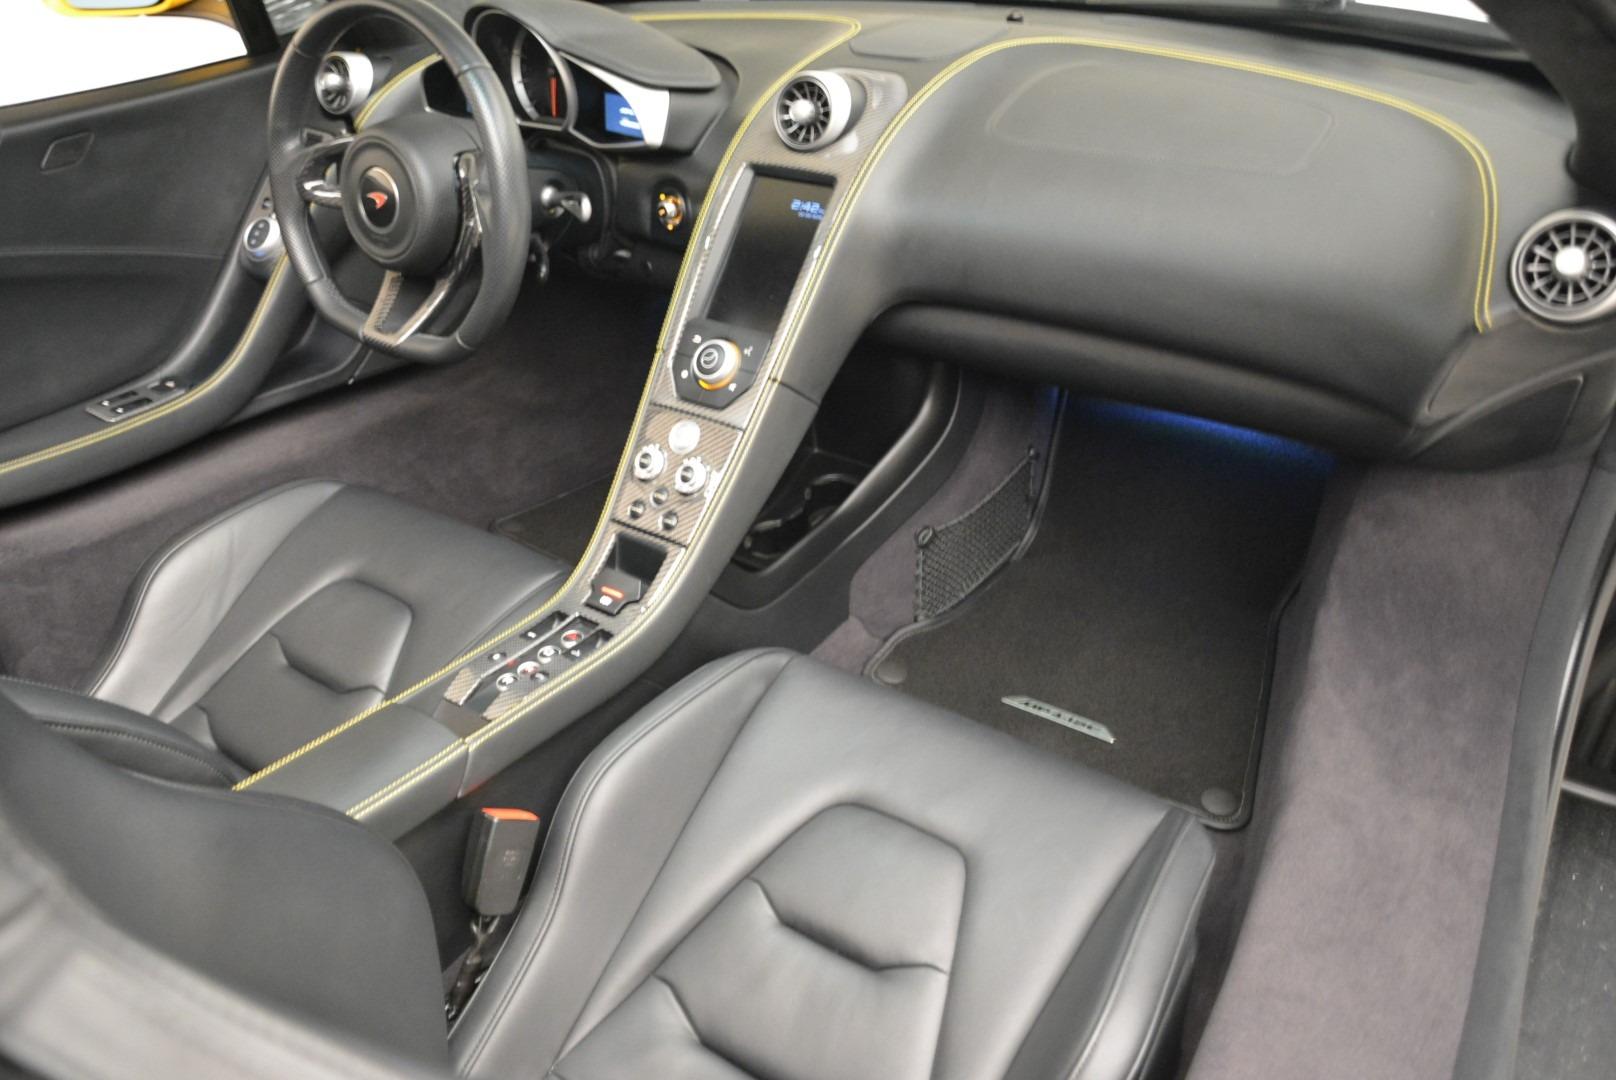 Used 2014 McLaren MP4-12C Spider For Sale In Greenwich, CT. Alfa Romeo of Greenwich, 3134 2057_p29